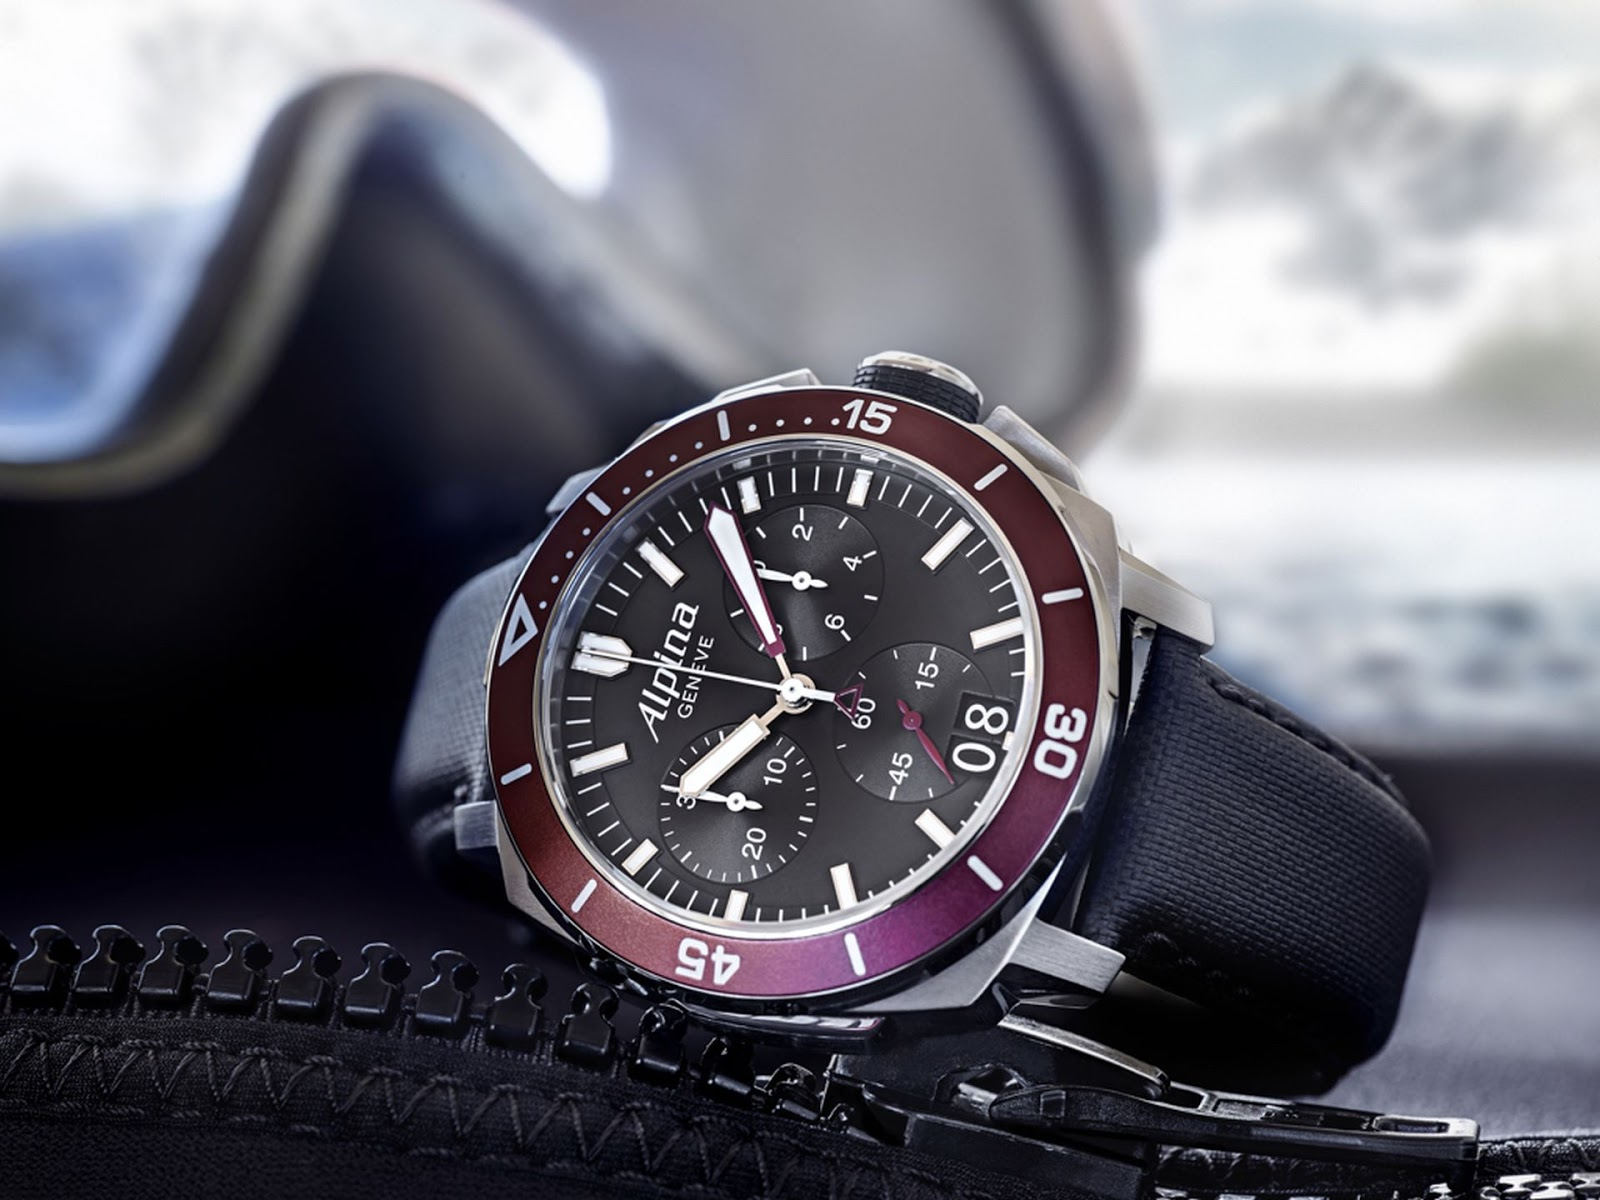 Alpina Seastrong Diver Chronograph Big Date MasterHorologer - Alpina diver watch